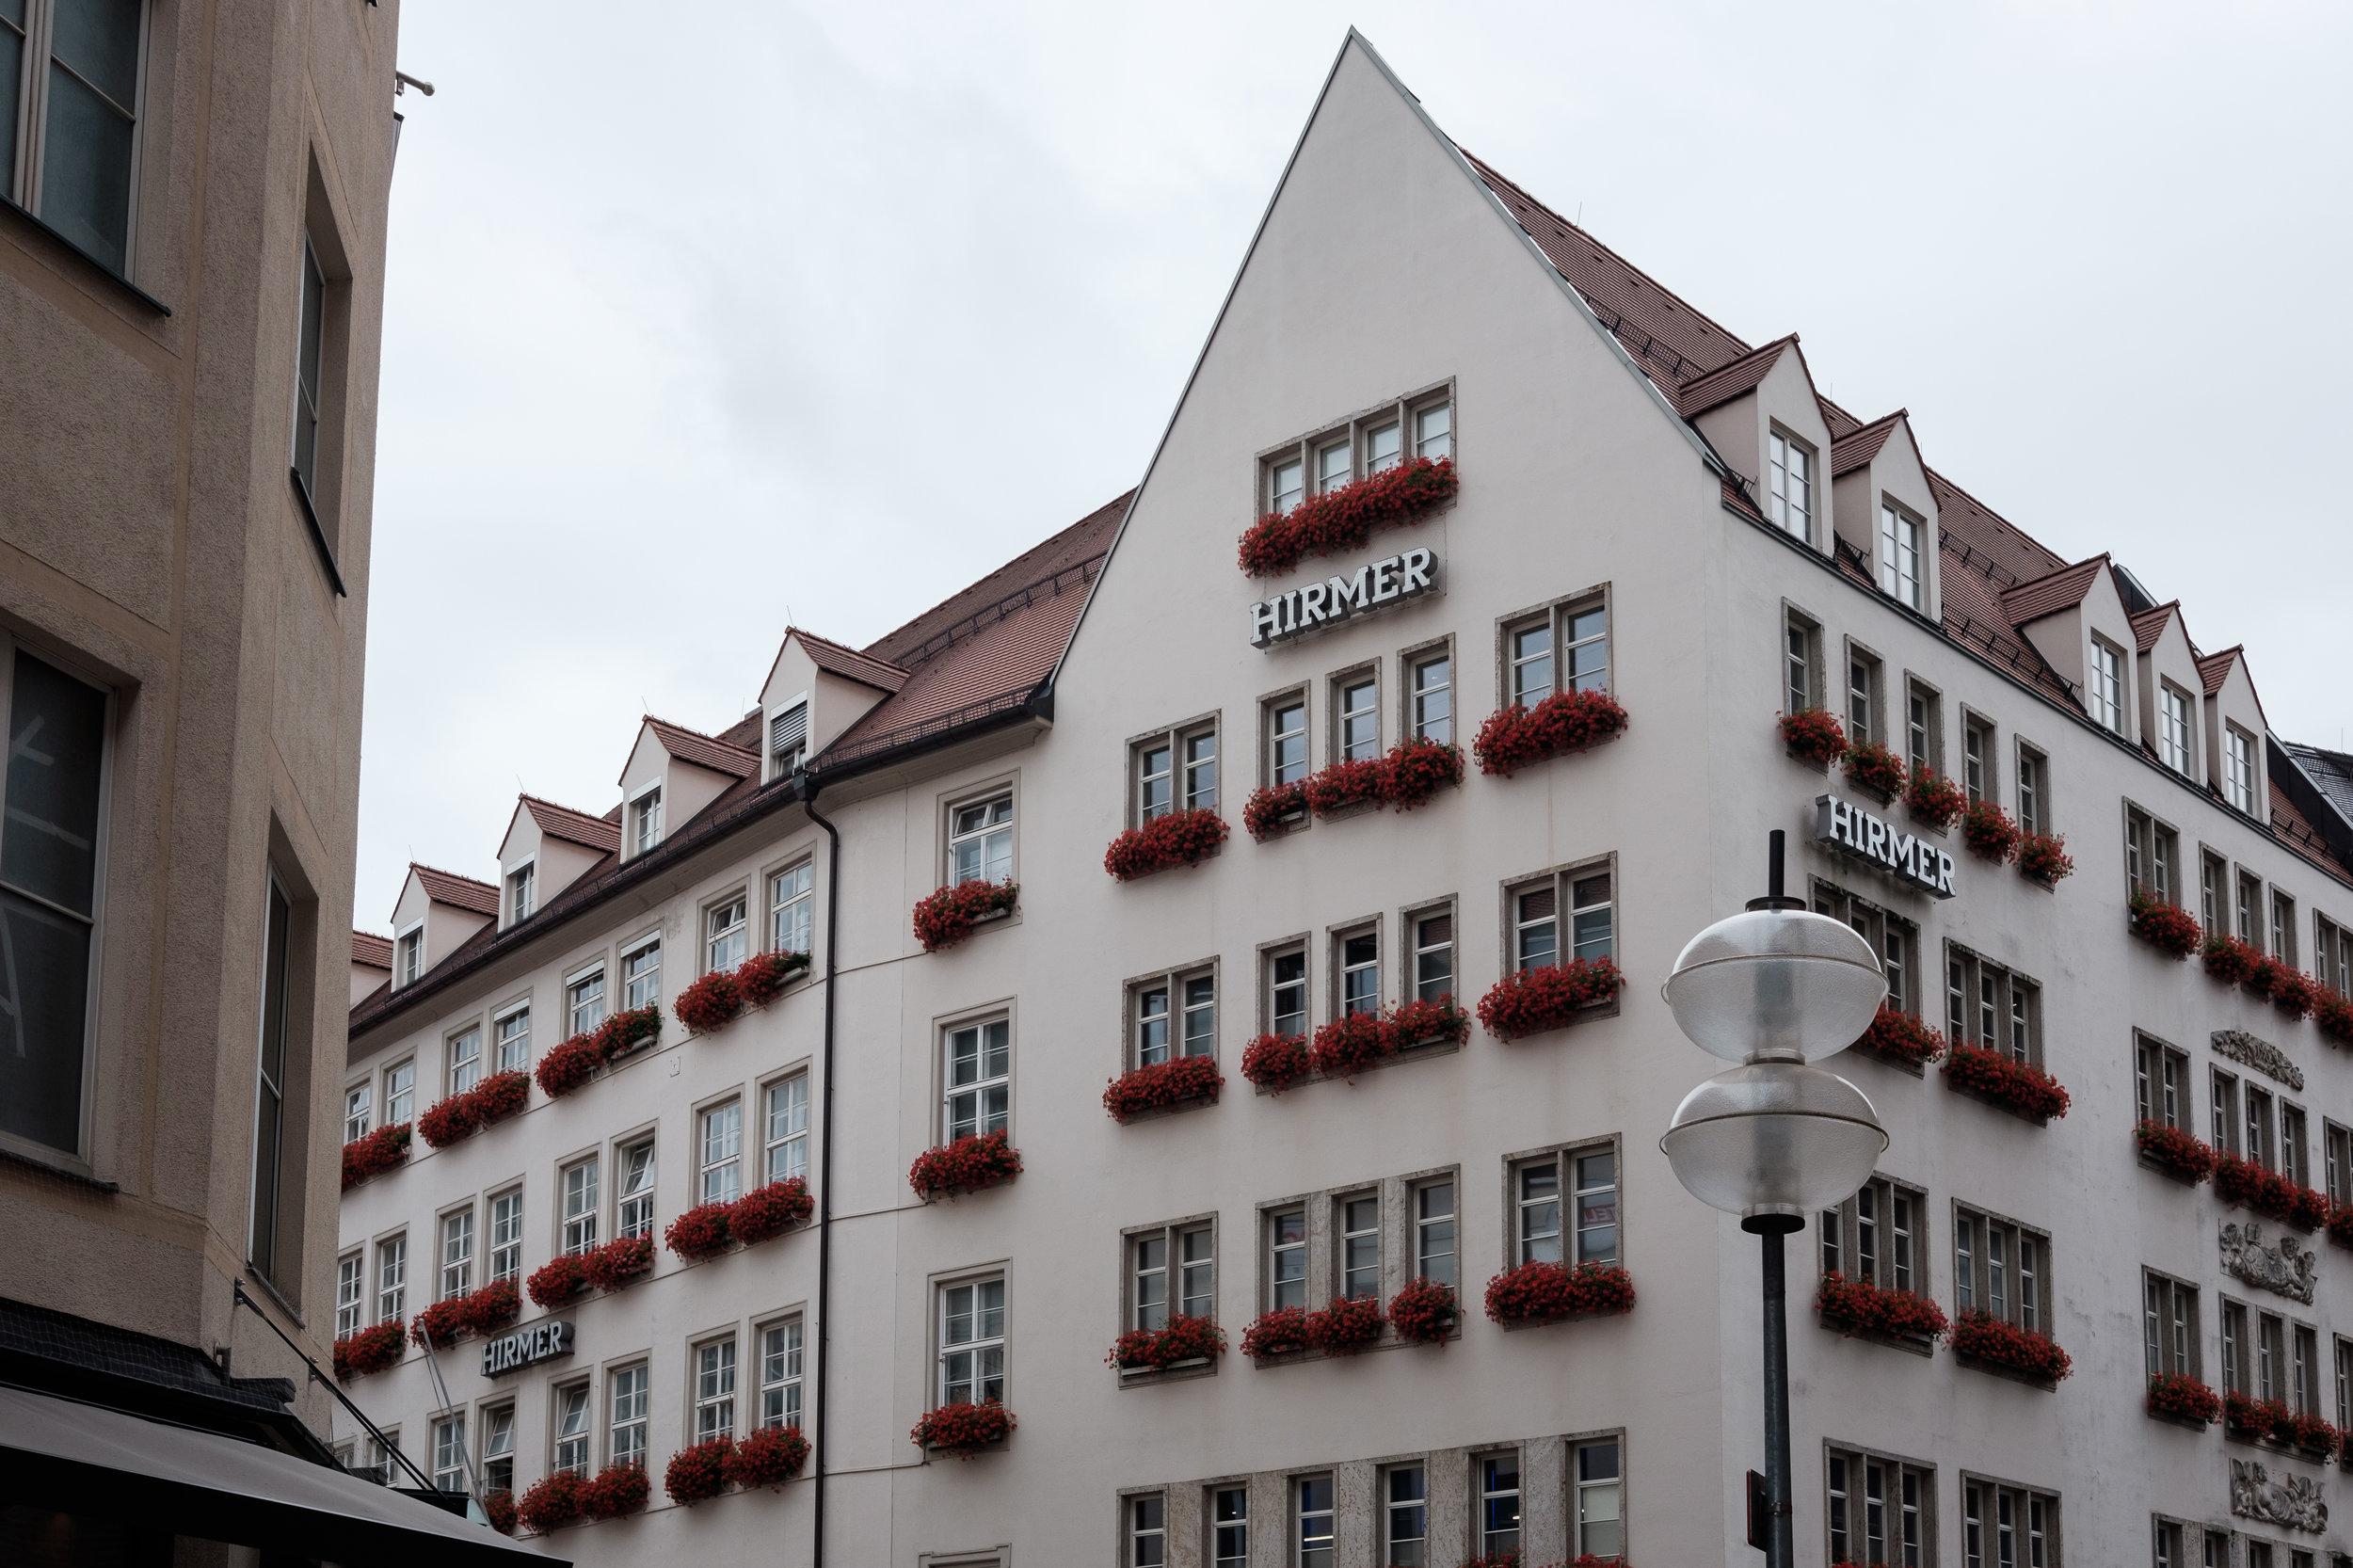 Victoria-Munich-Germany-0088.jpg